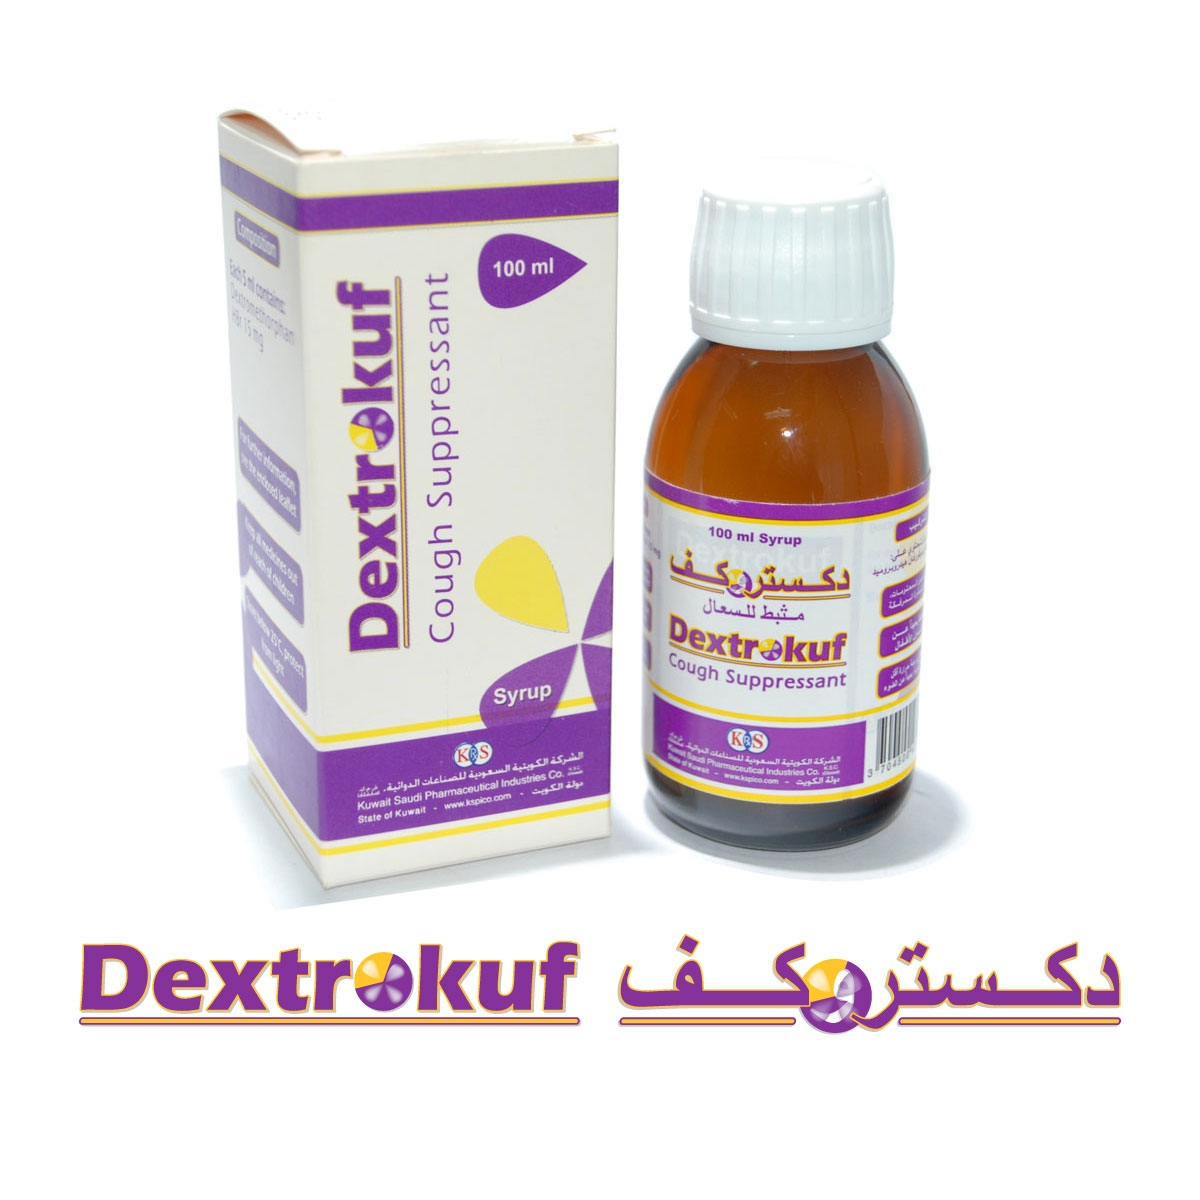 Kuwait Saudi Pharmaceutical Industries Company